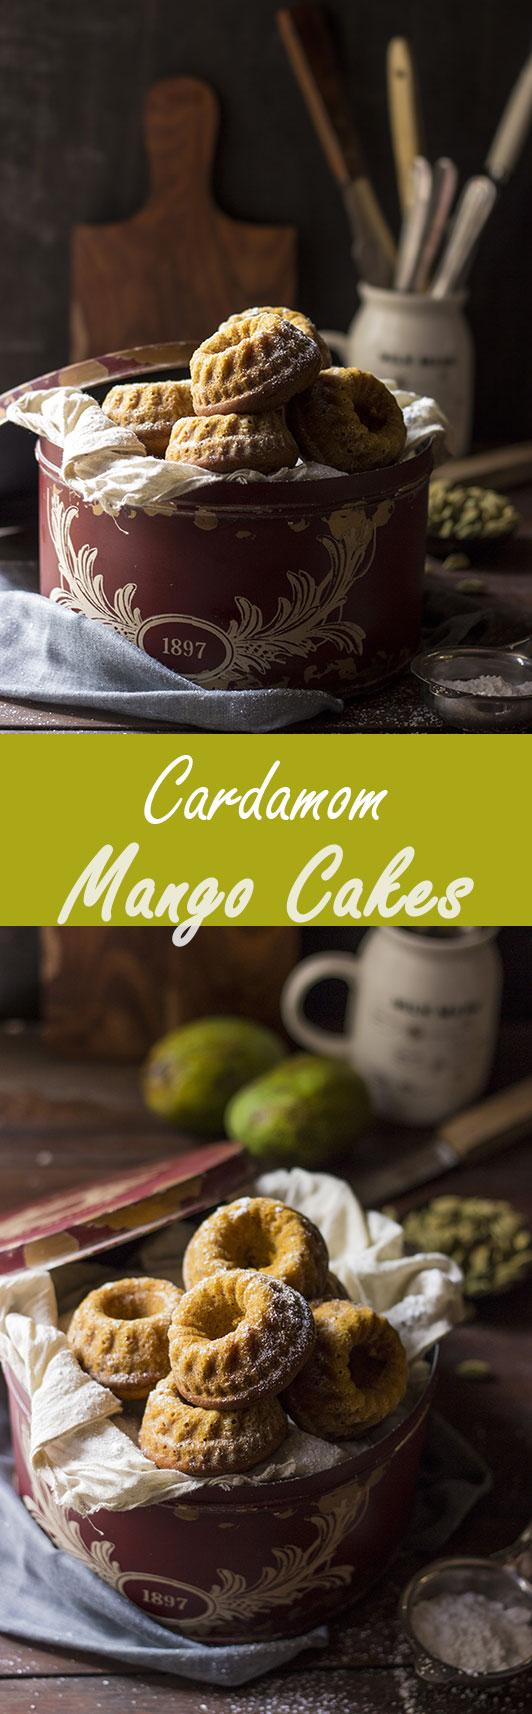 Cardamom Mango Cakes